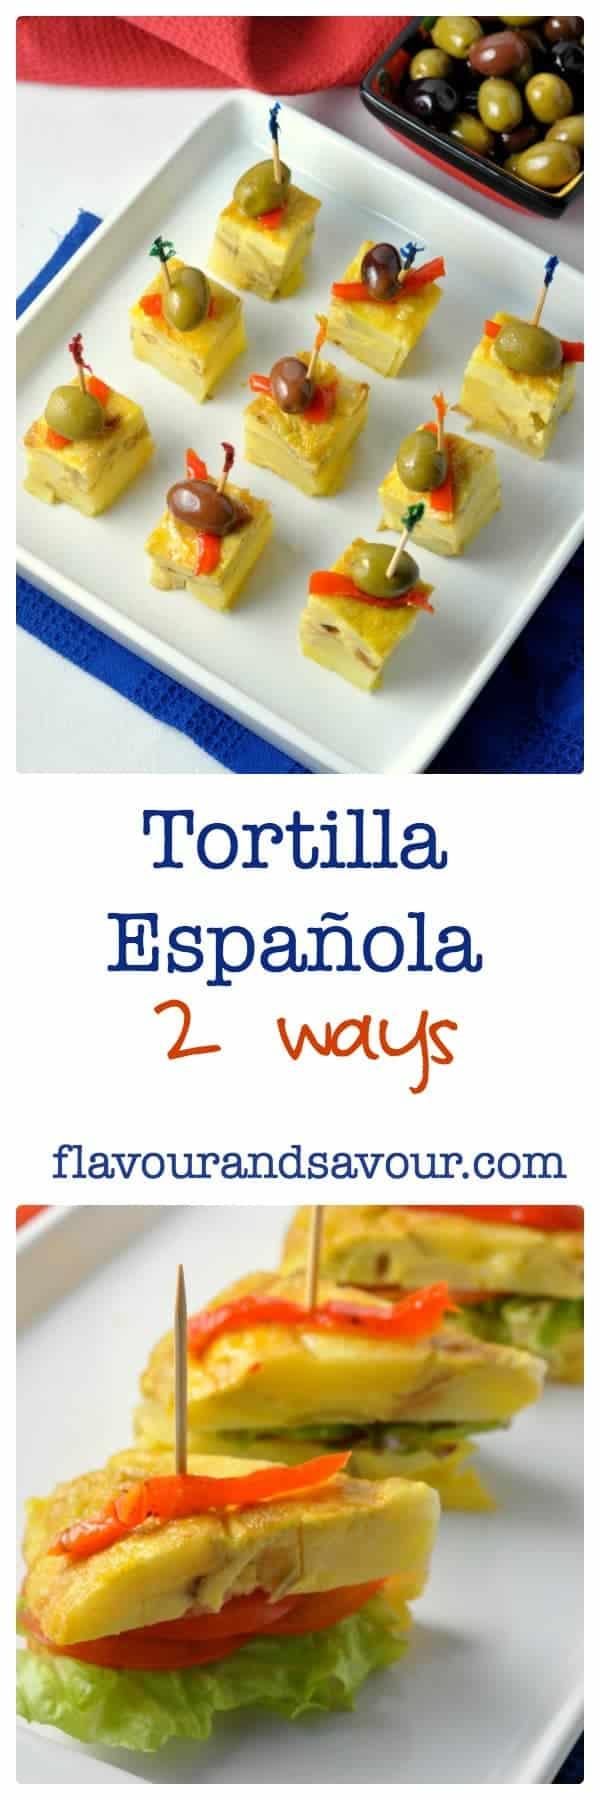 Tortilla Española. Traditional Spanish tapa two ways |www.flavourandsavour.com